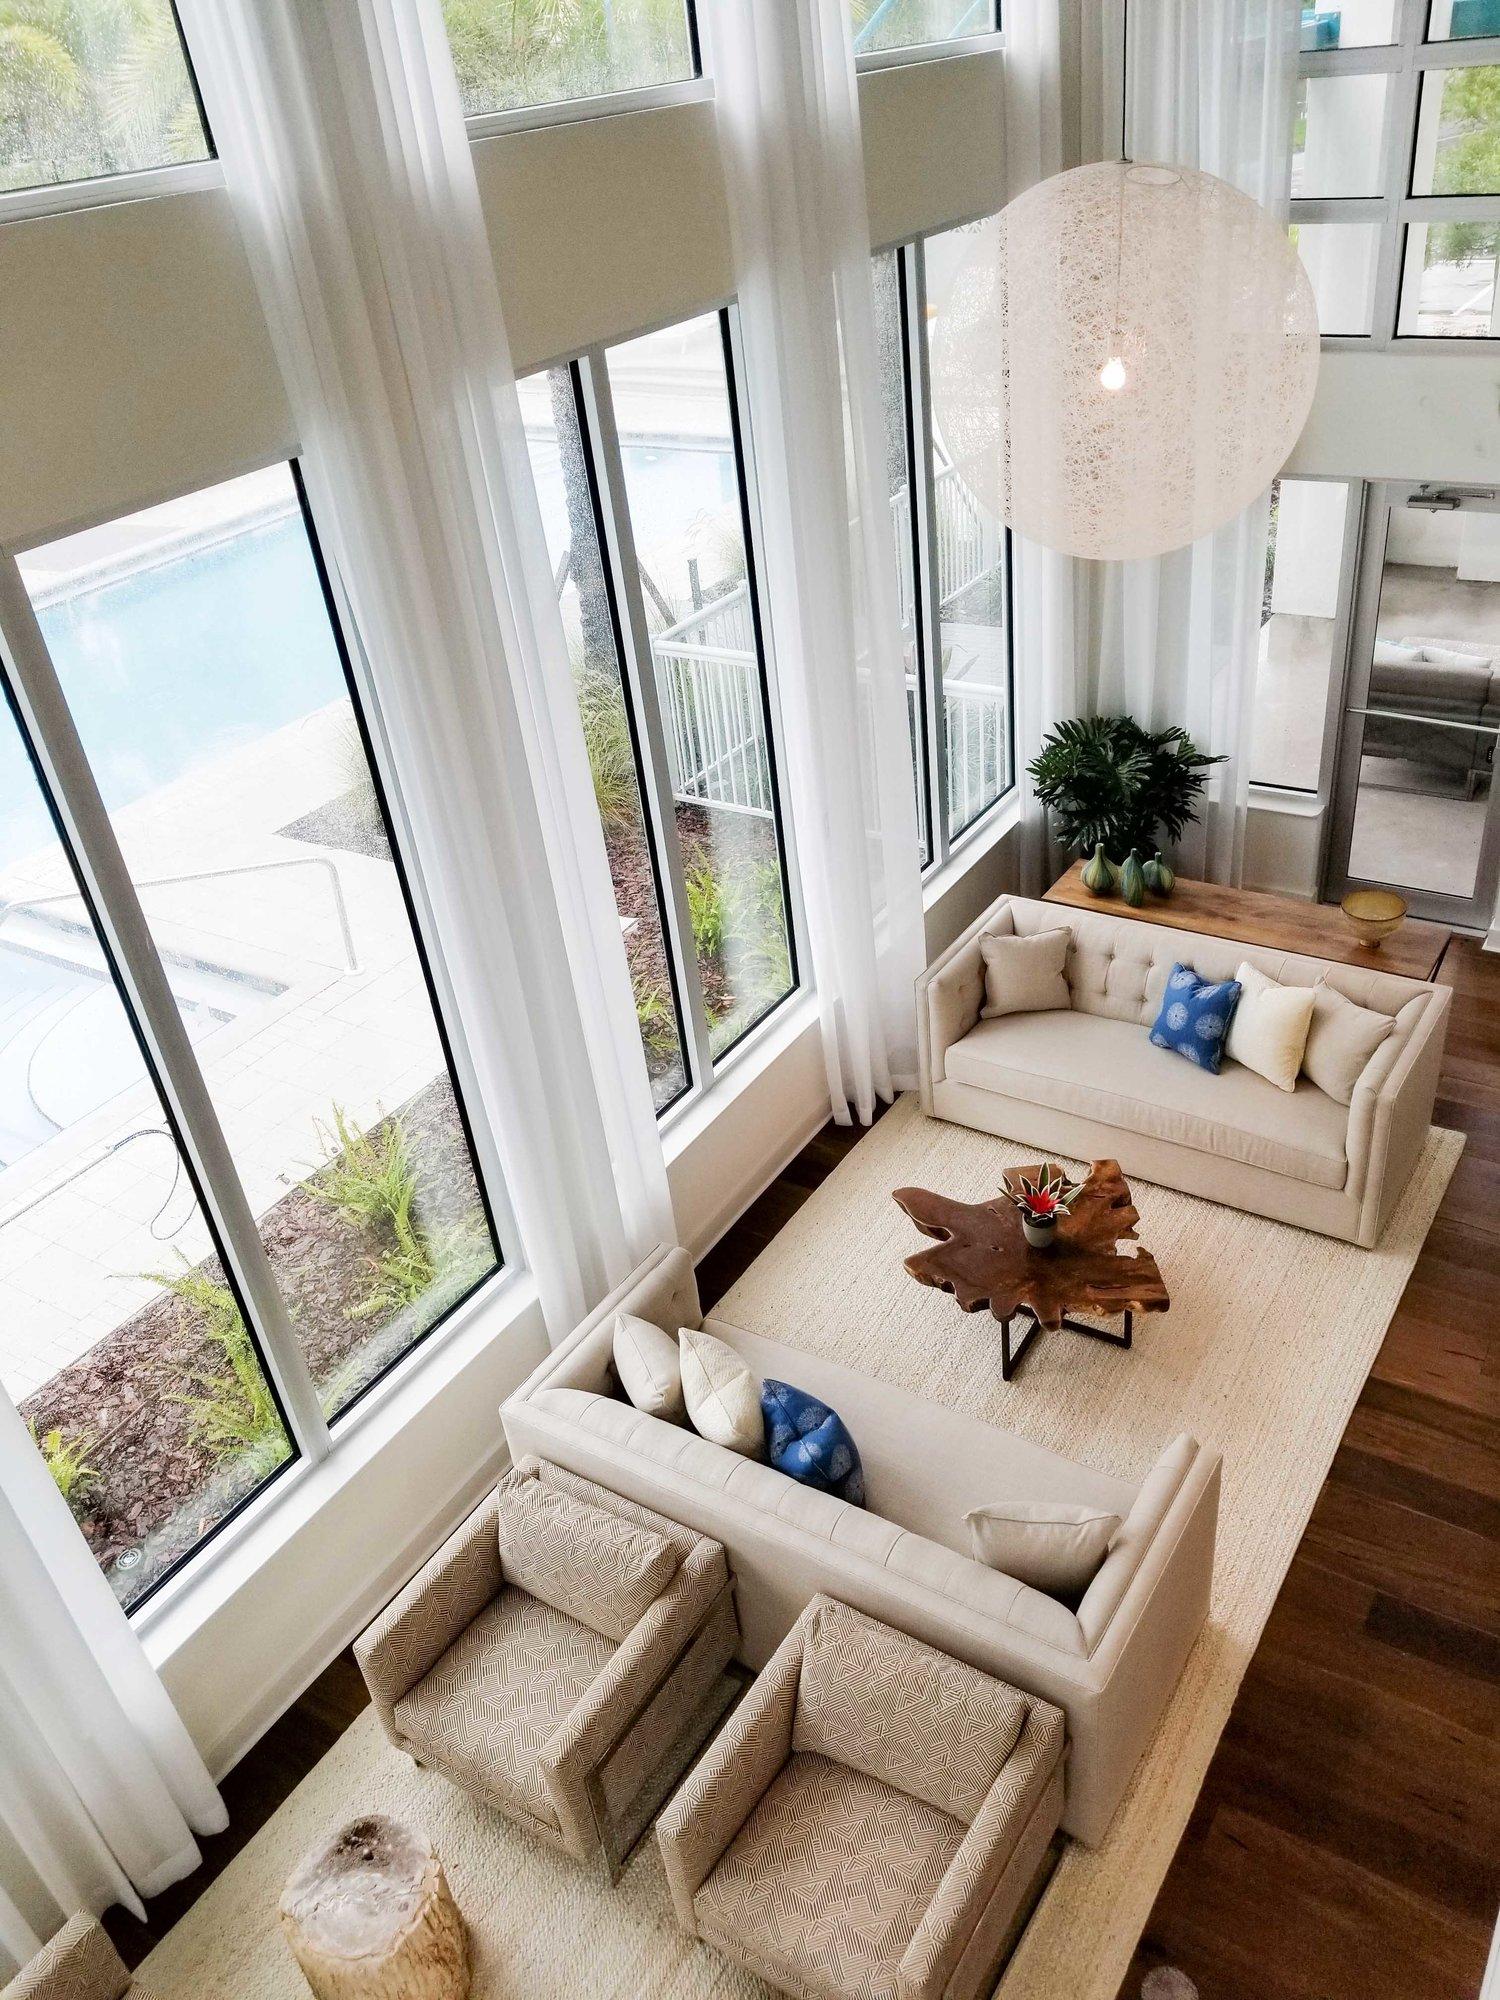 50 paramount modern apartment living in sarasota fl interior